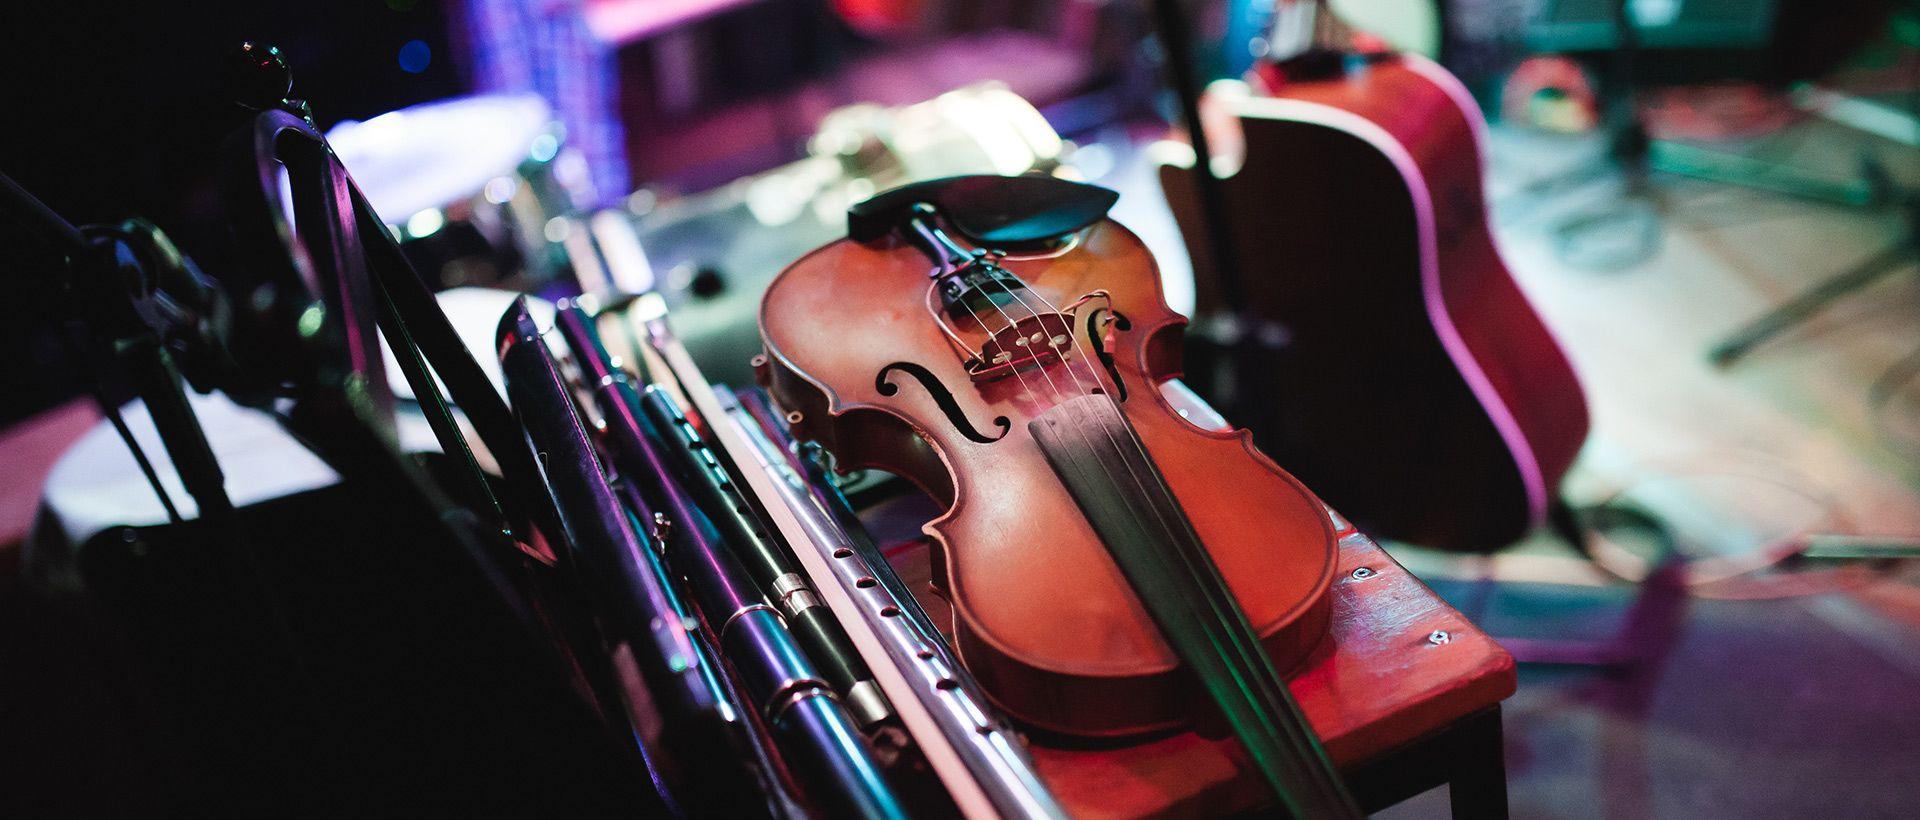 Camping Musikfestival Musicalies en Sologne